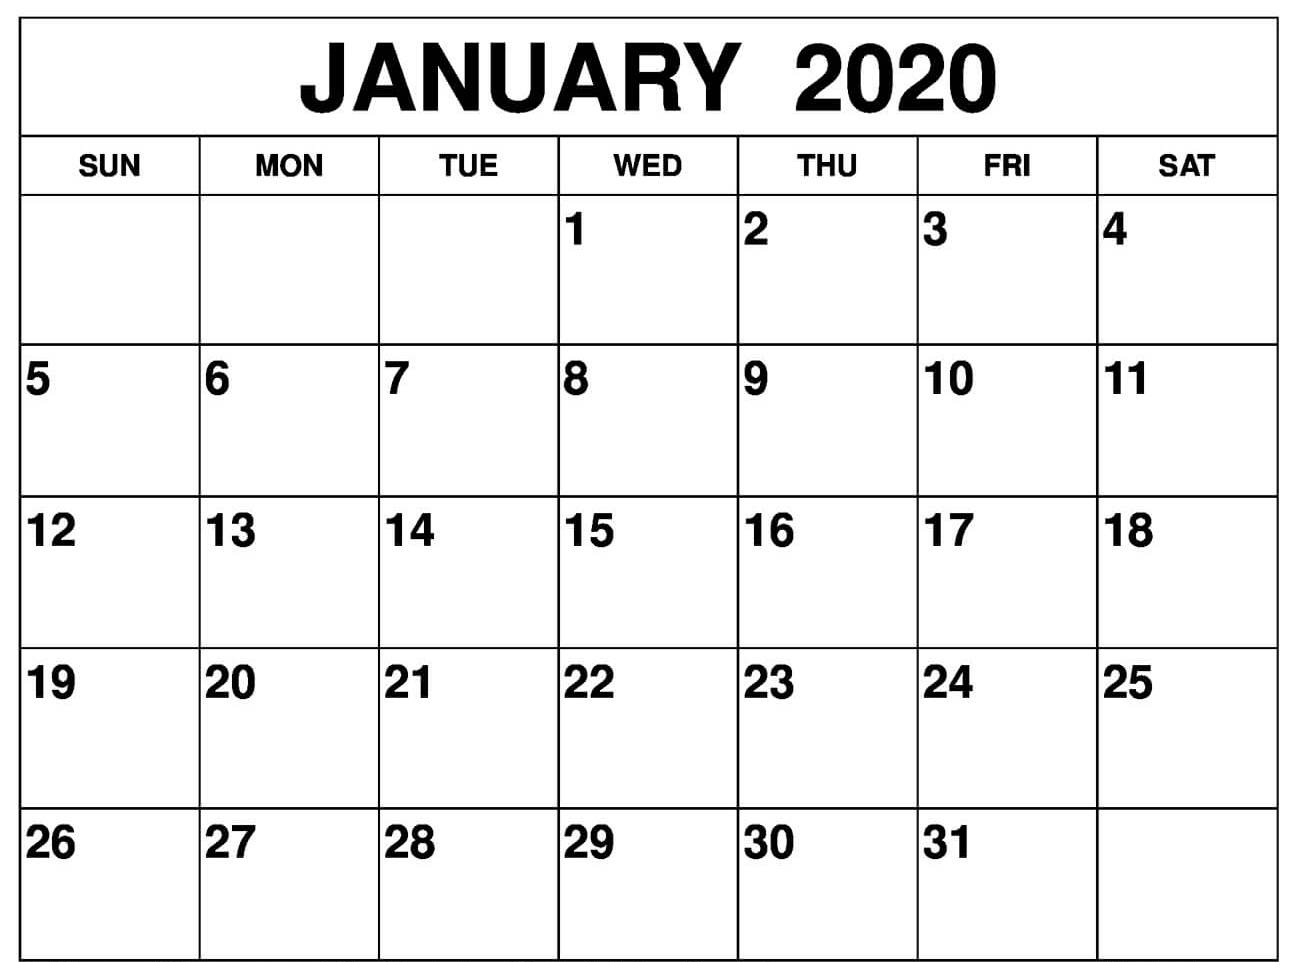 January 2020 Calendar Nz Bank Holidays | Free Printable